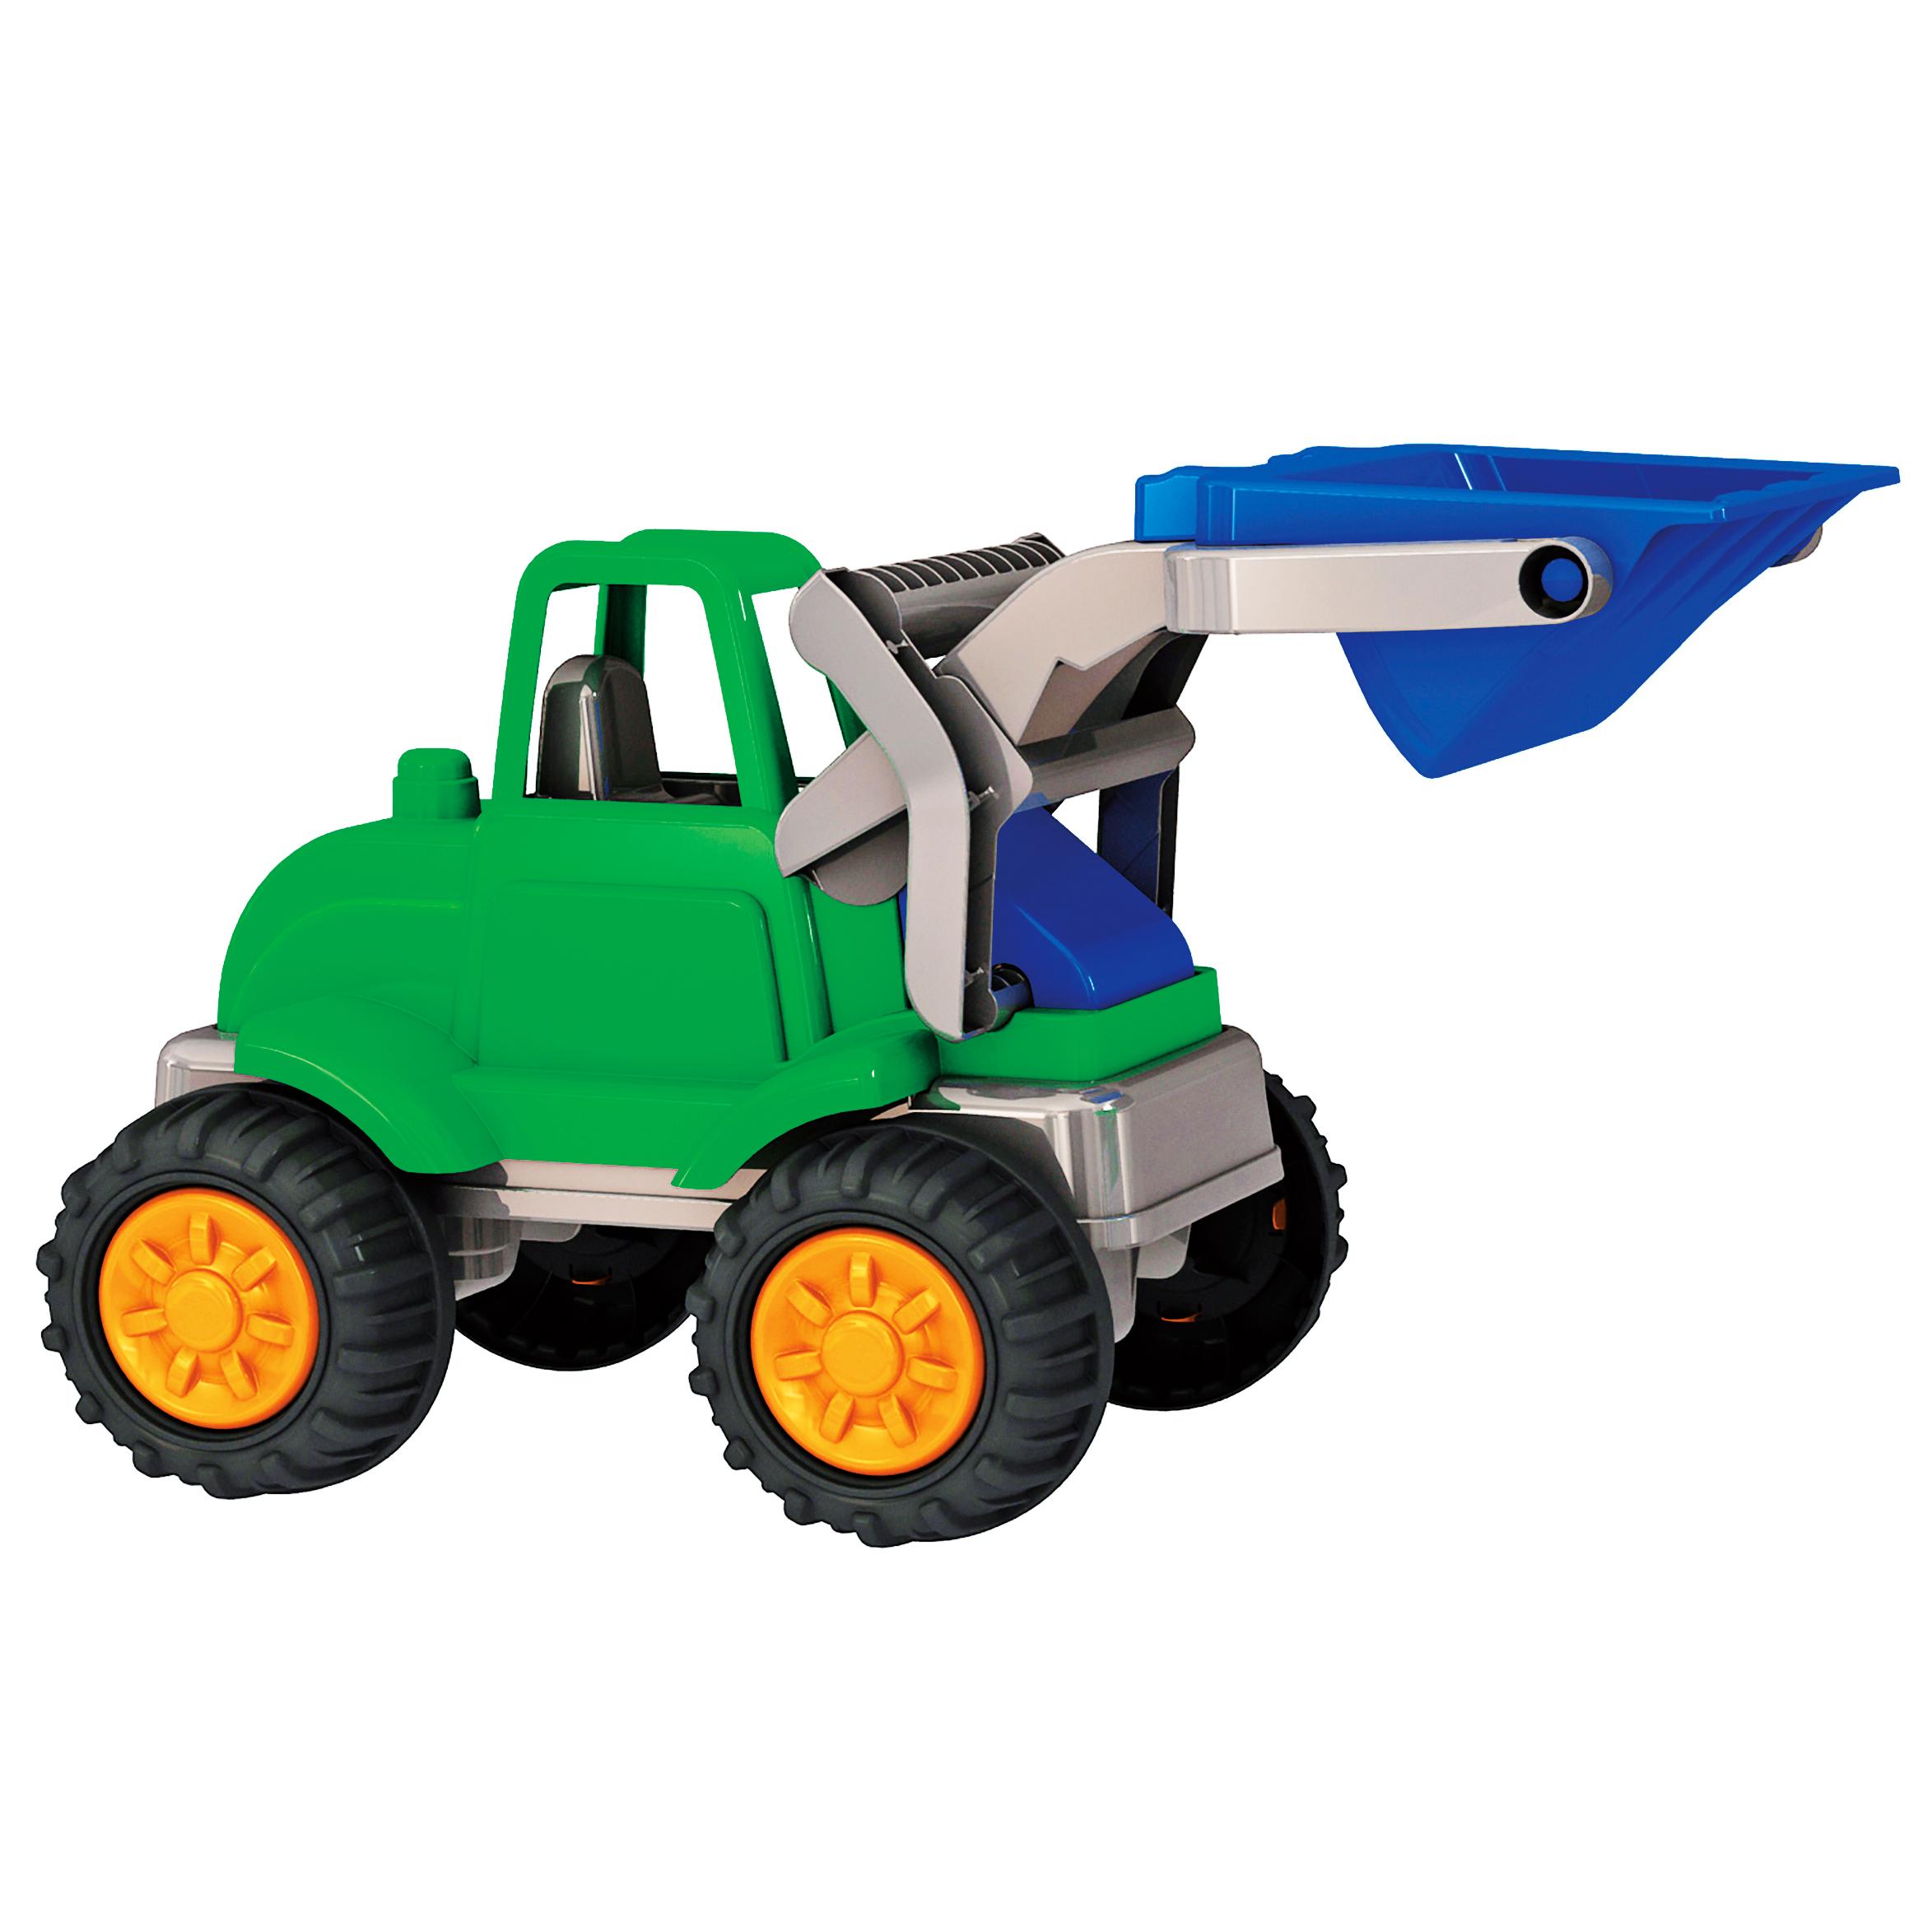 American Plastic Toys Heavy-Duty Gigantic Loader